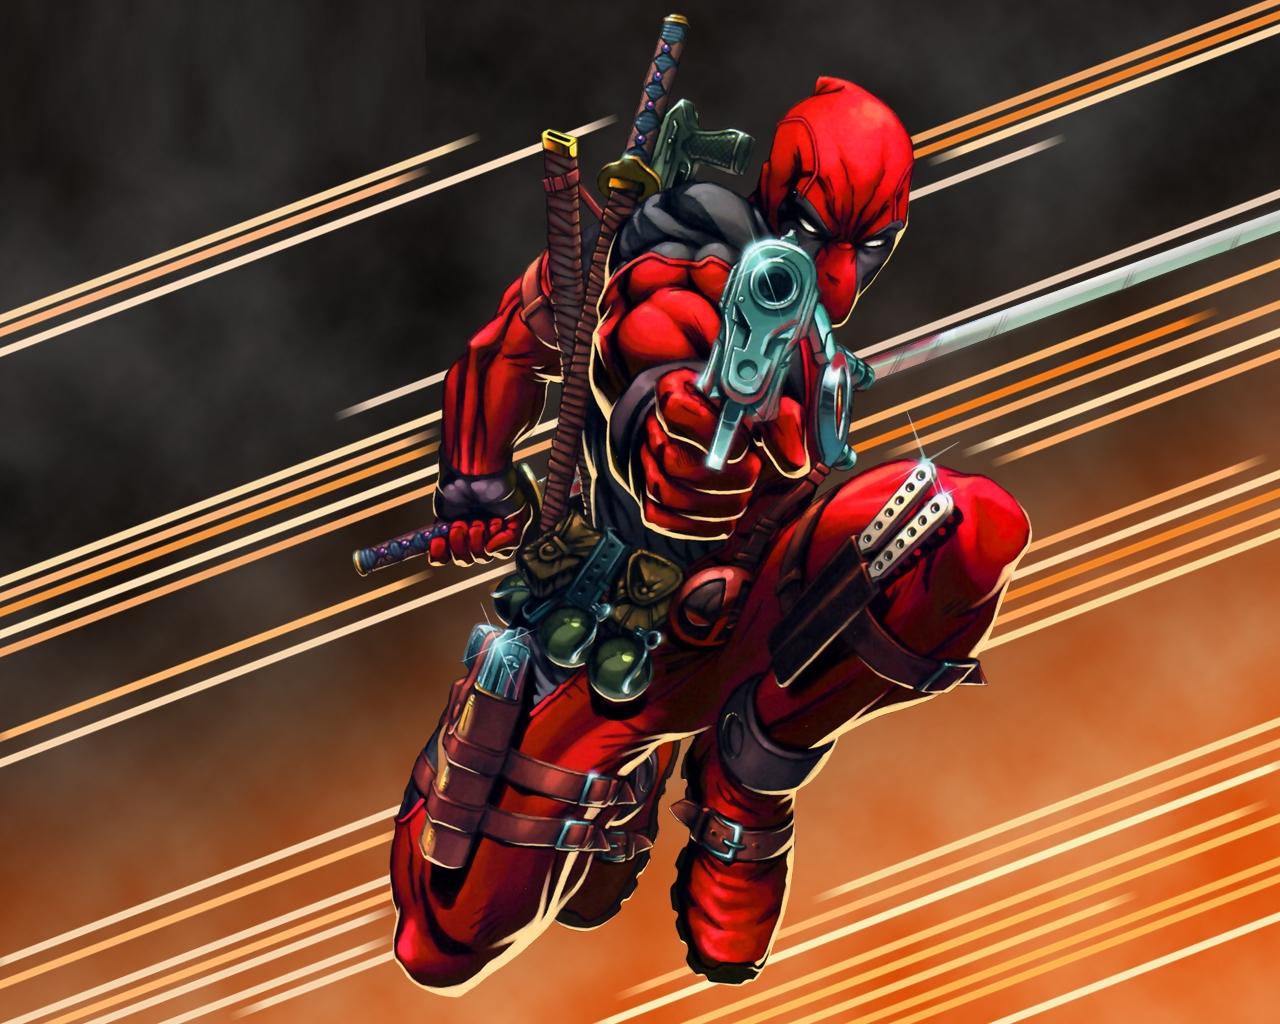 Deadpool Wallpaper Hd 1280x1024 pixel Popular HD Wallpaper 43809 1280x1024